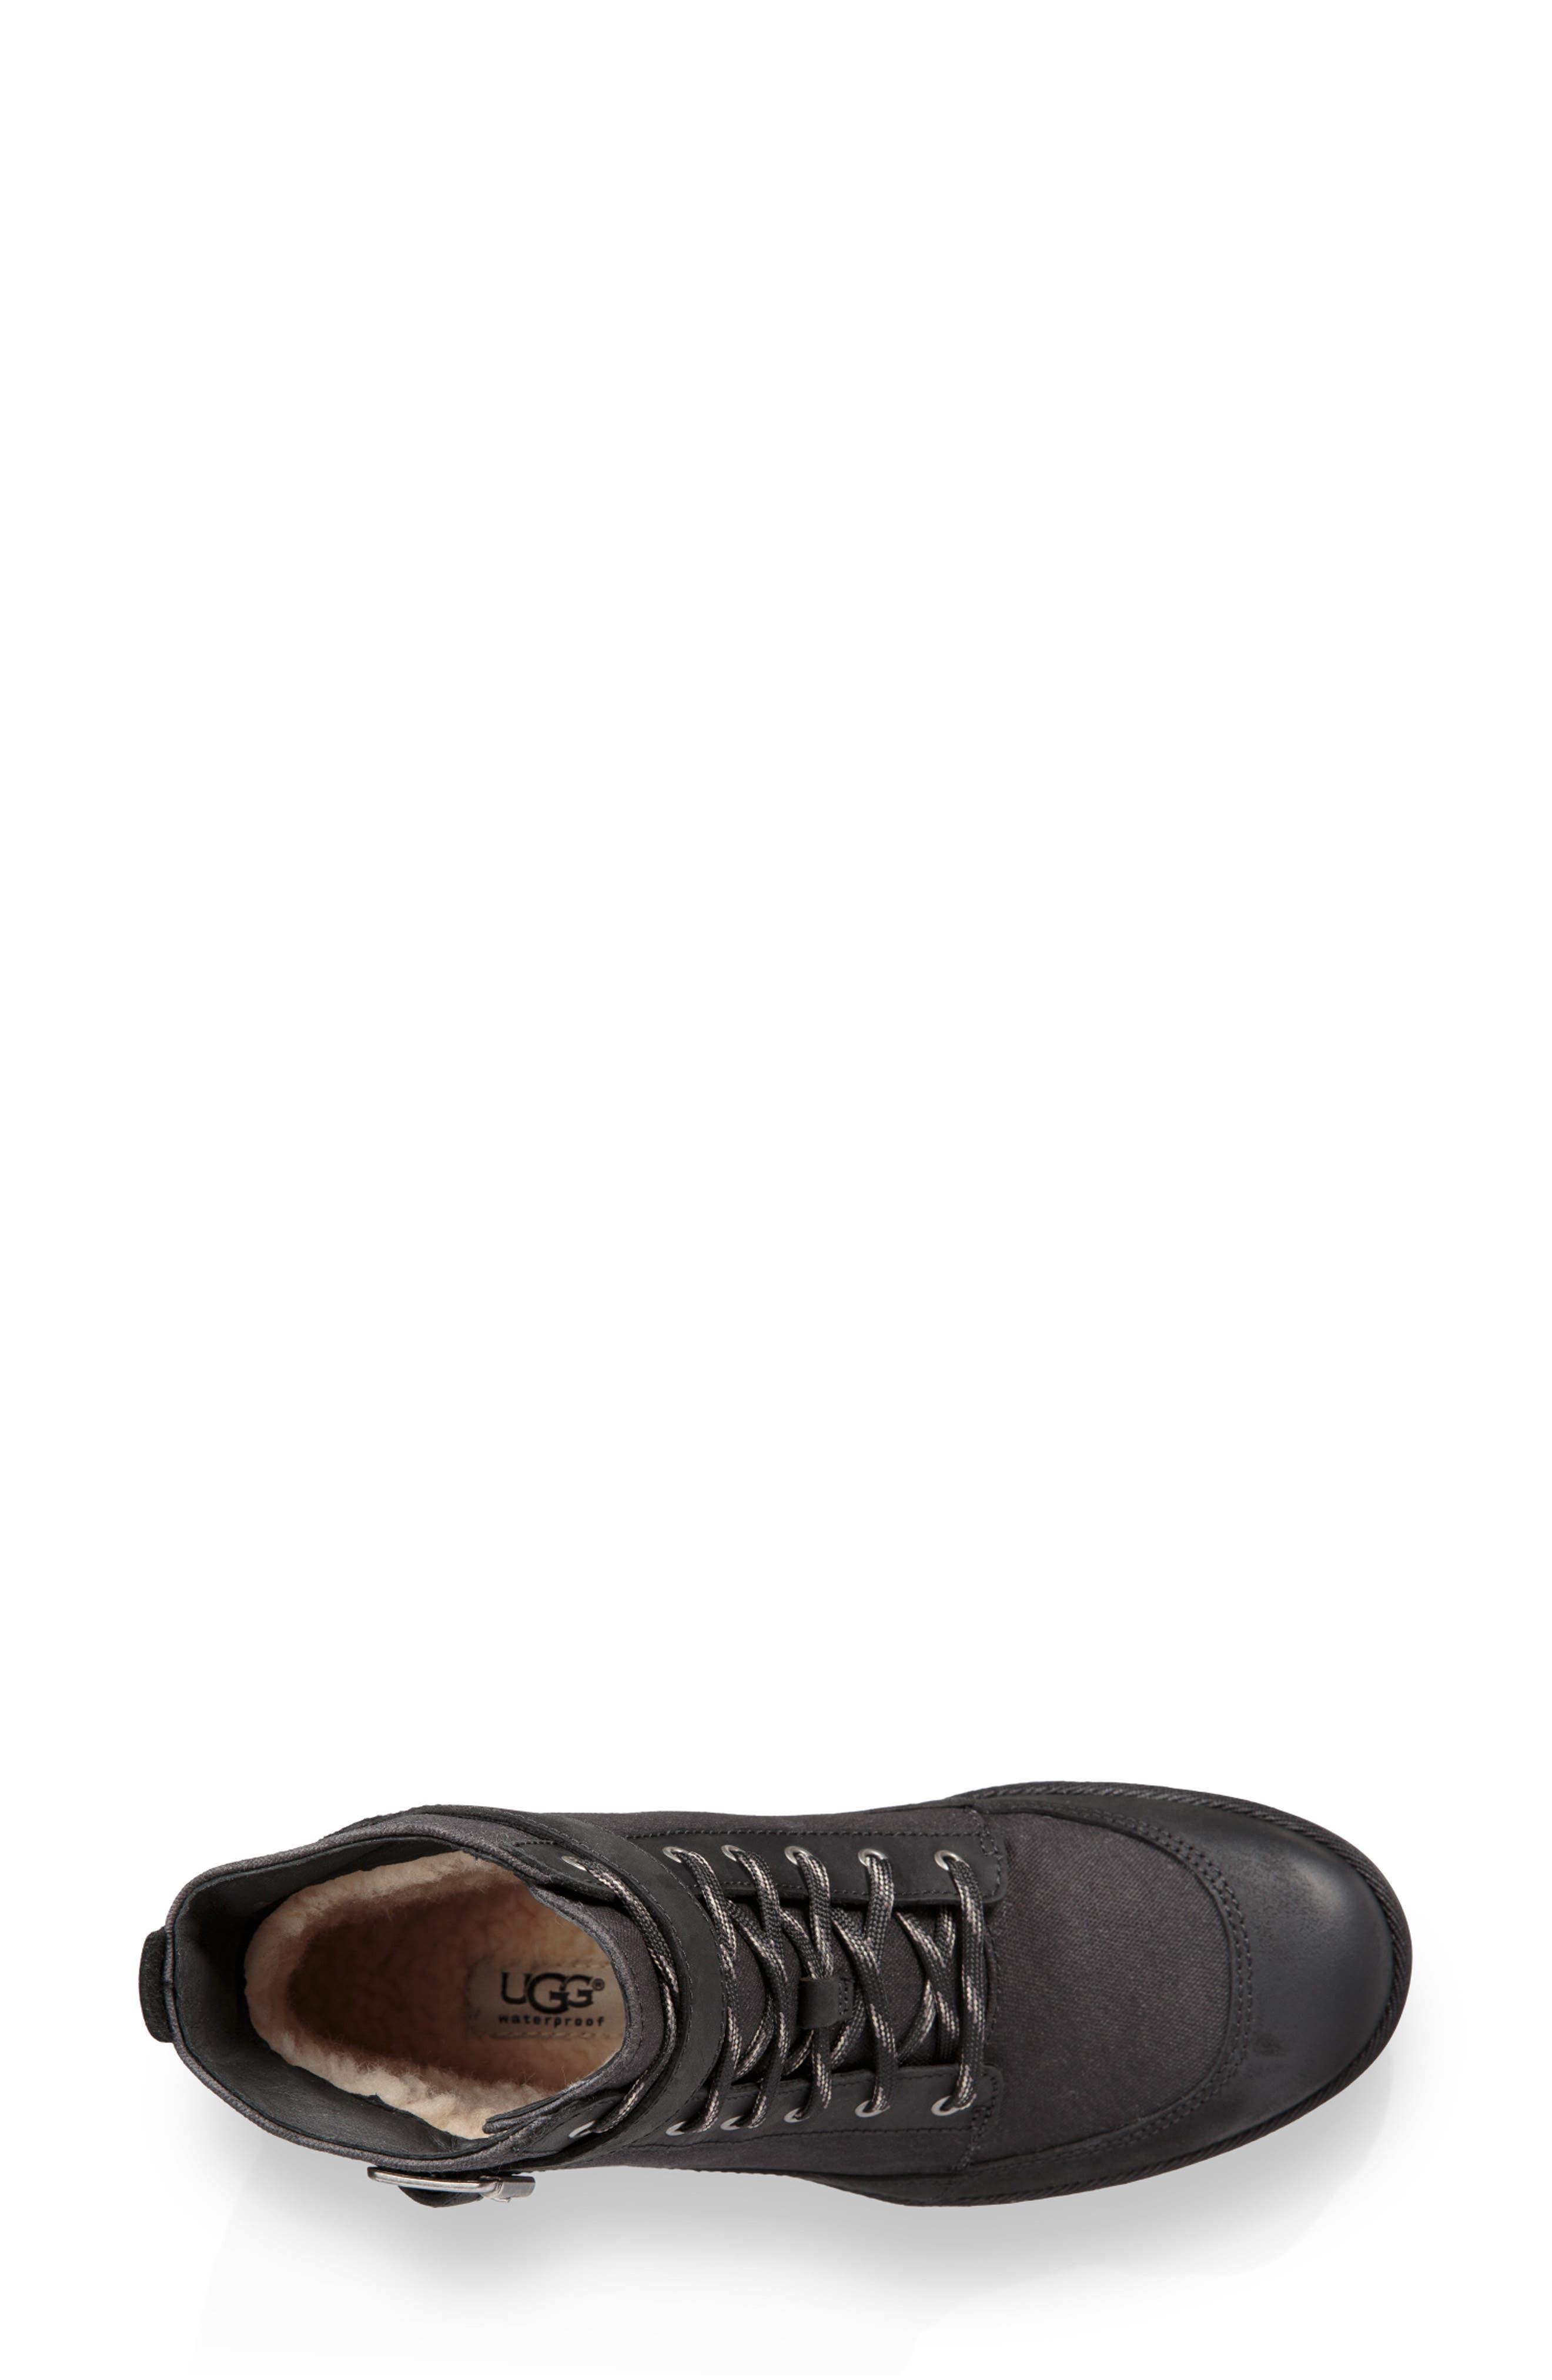 Tulane Waterproof Boot,                             Alternate thumbnail 4, color,                             BLACK LEATHER